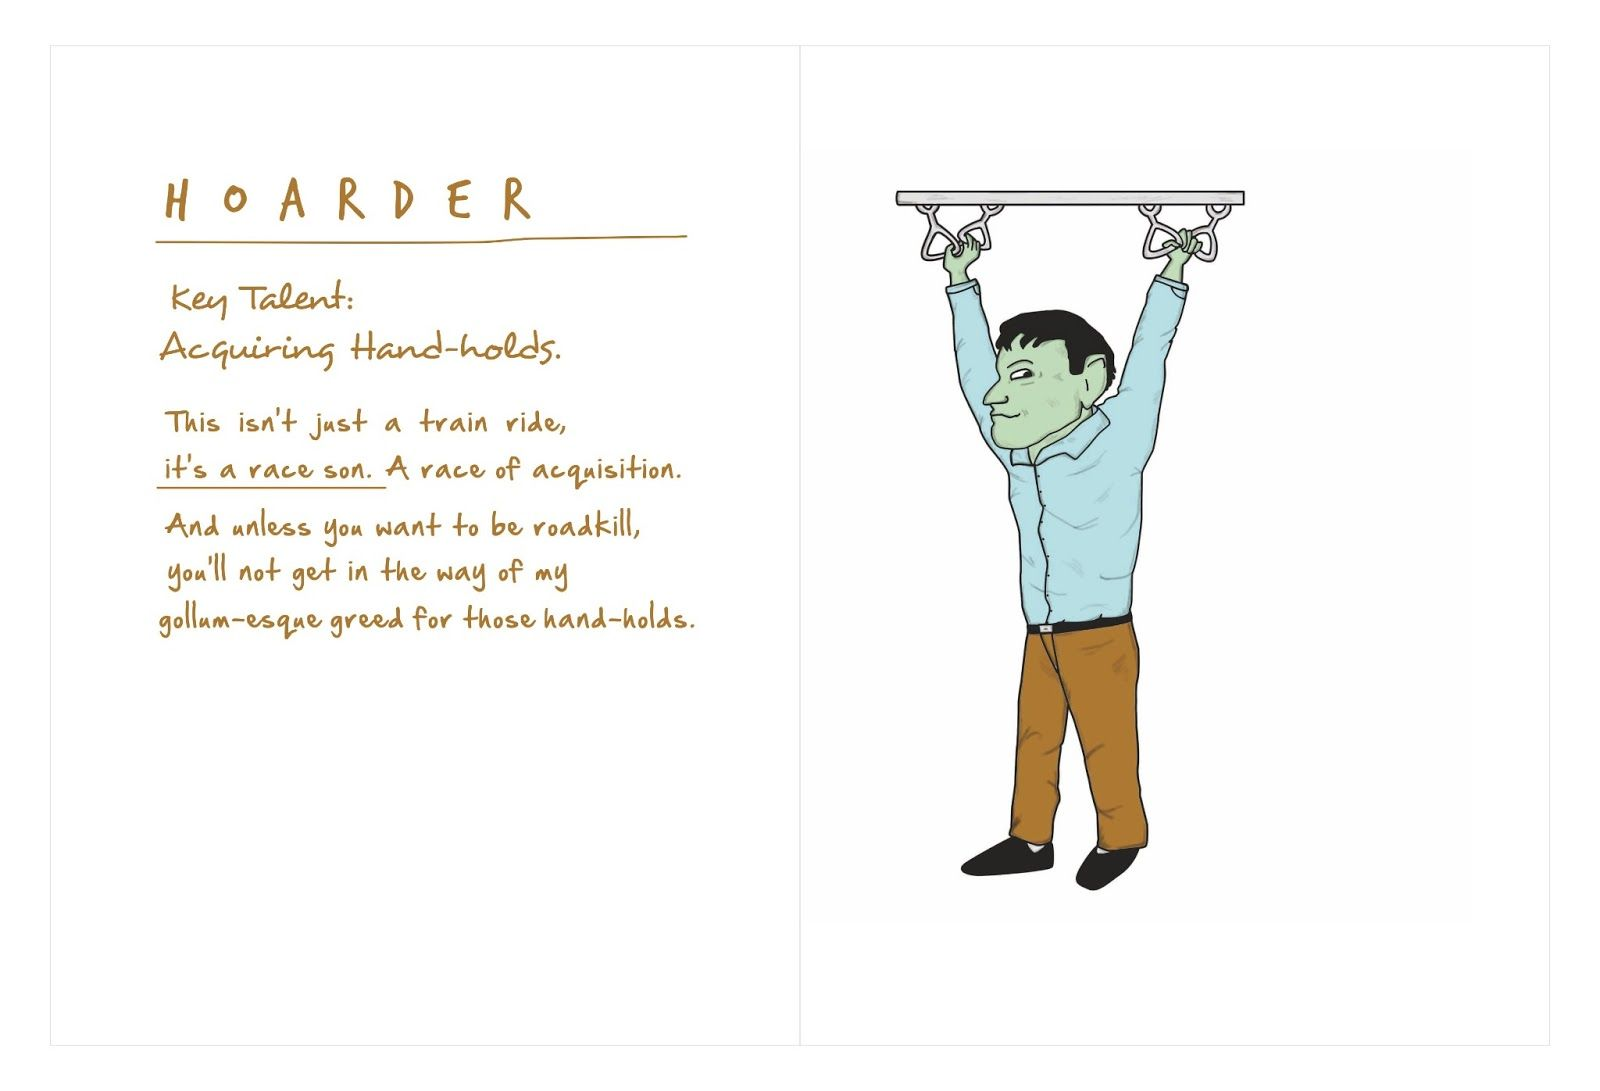 I Take This Train Too - caricatures & comical profiles of the Mumbai train travellers.